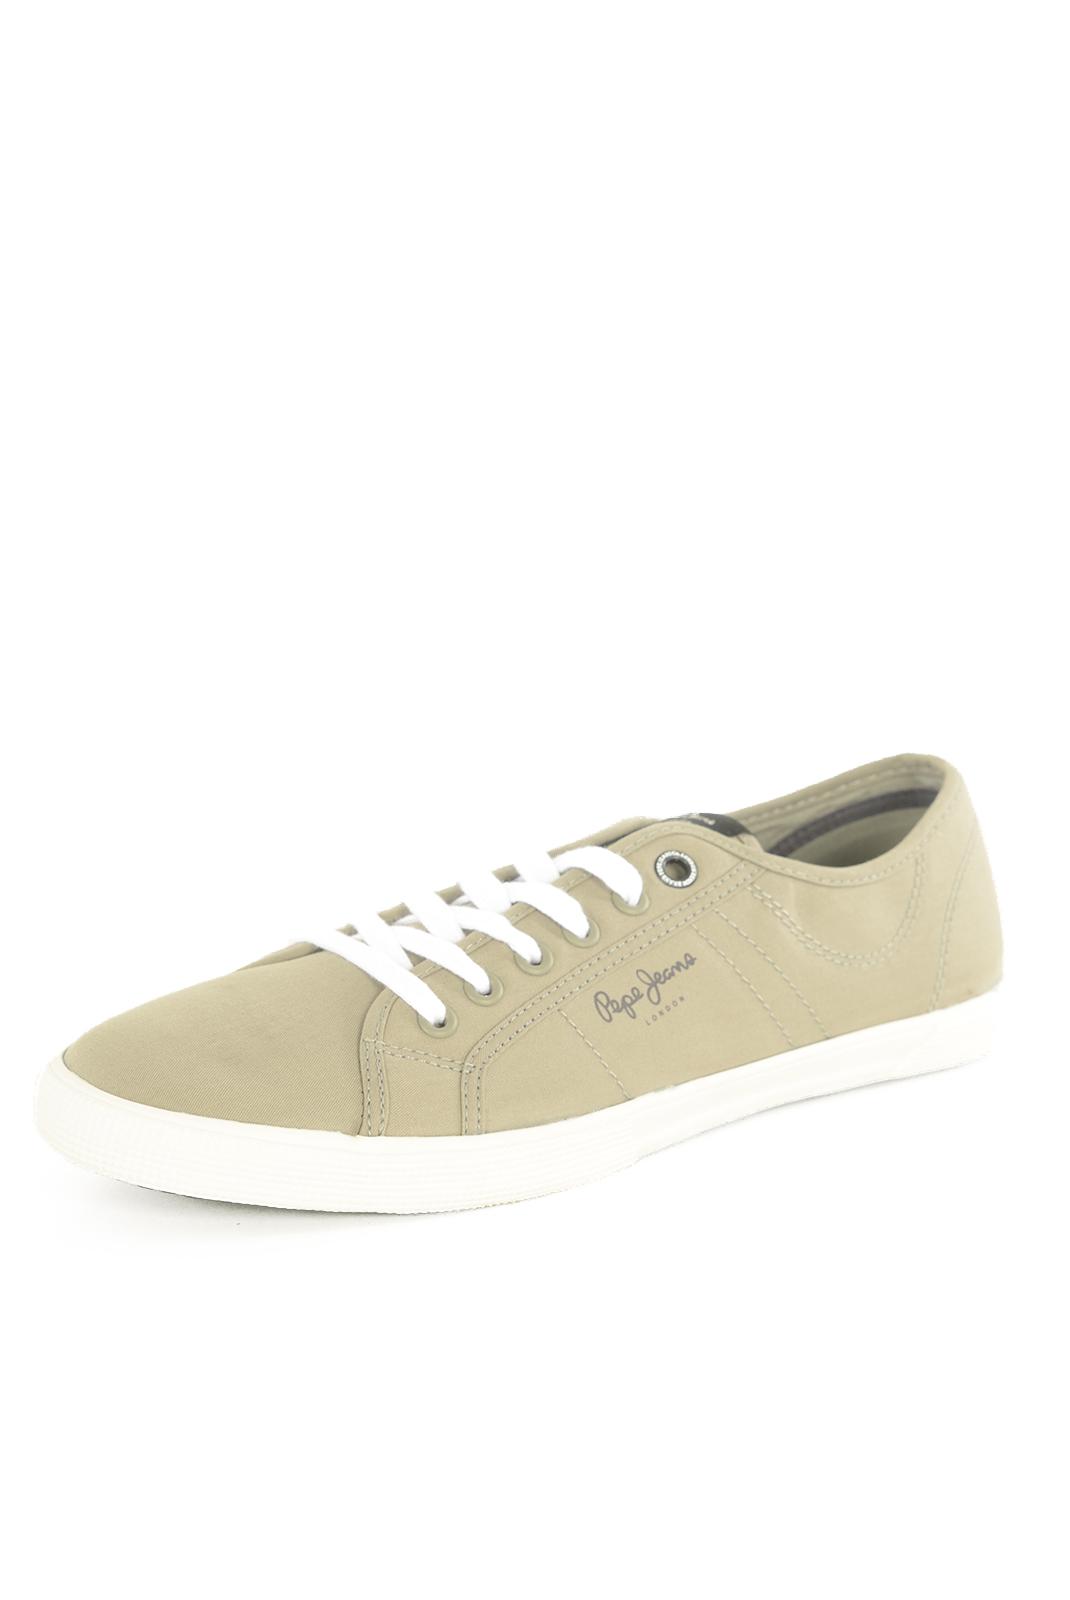 Baskets / Sport  Pepe jeans PMS30352 ABERMAN 2.1 915 POP LT GREY